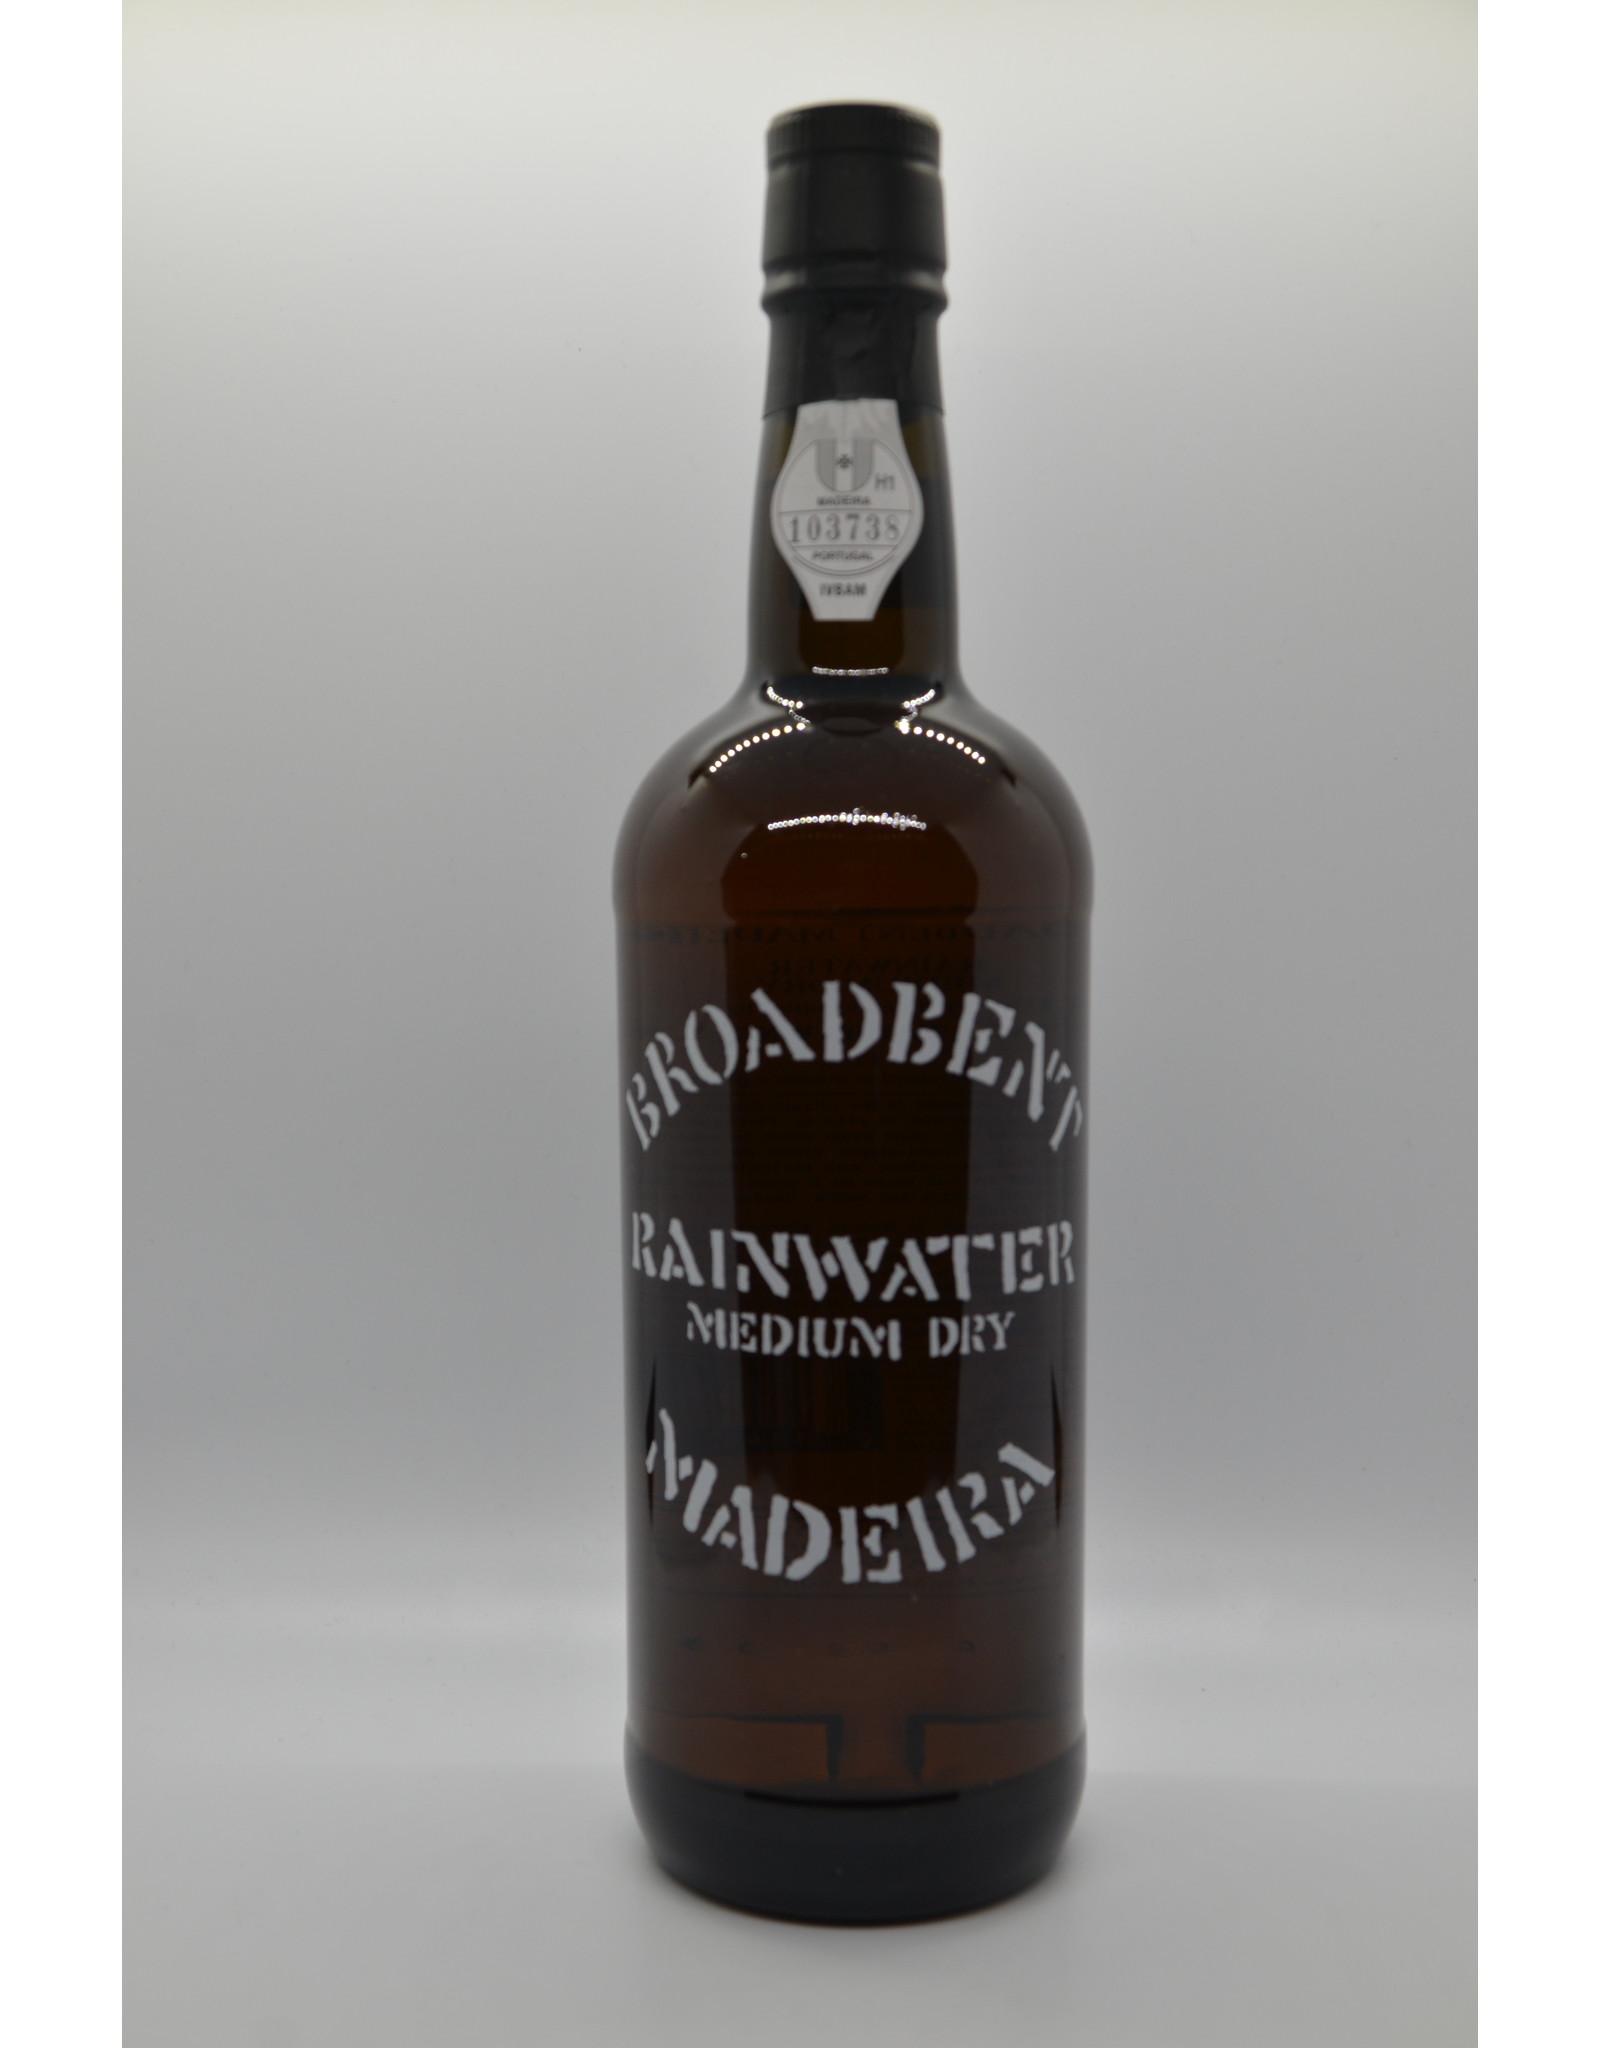 Portugal Broadbent Madeira Rainwater 375ml